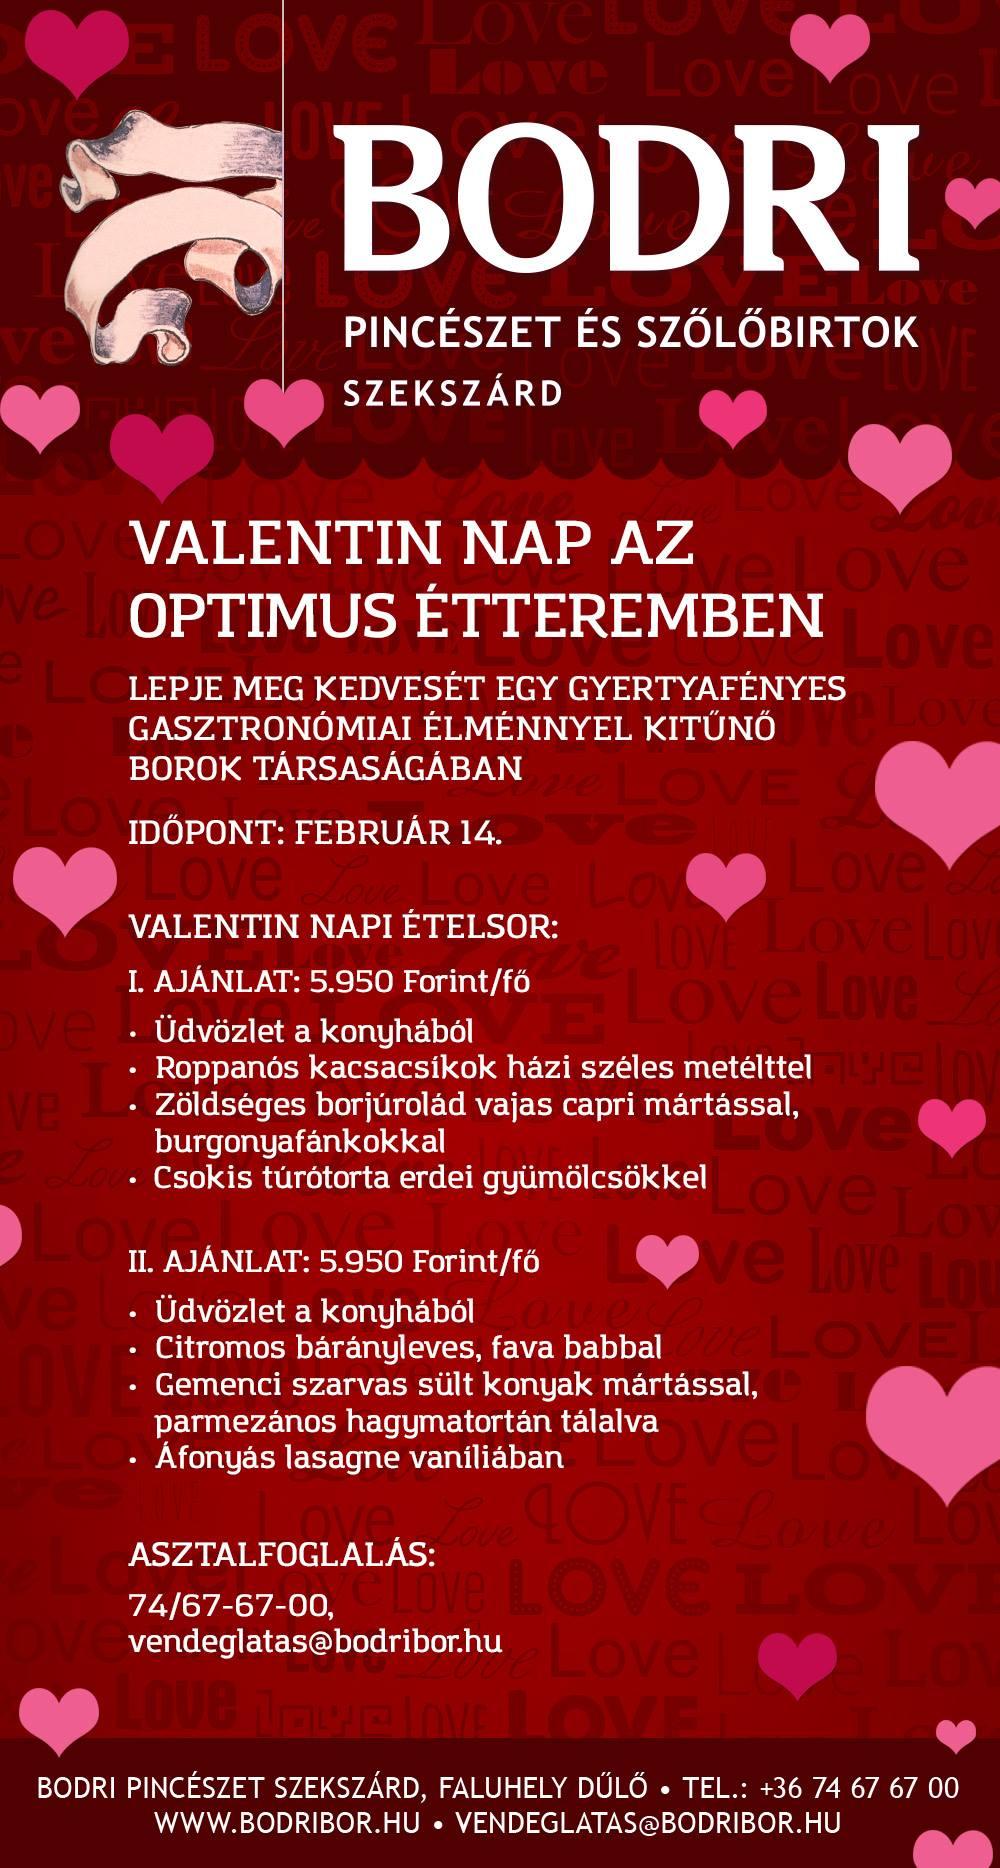 bodri_pinceszet_valentin